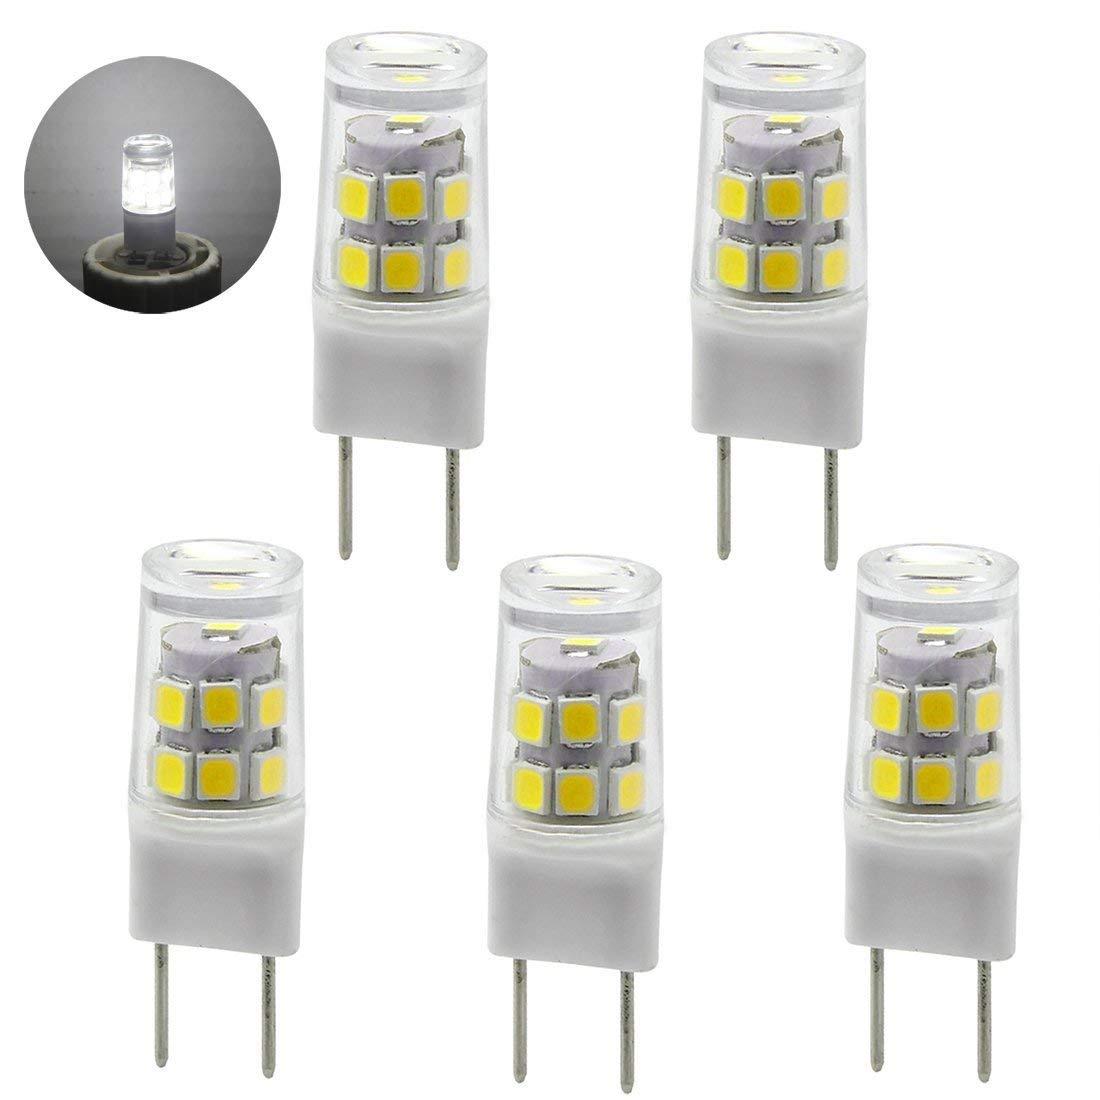 LED G8 Bi-pin Base Bulb,2.5W, 120V Daylight 6000K,20W Equivalent T4 G8 Base Halogen LED Replacement Bulb for Under-Cabinet Accent Puck Light Desk Lamp Lighting (5-Pack)